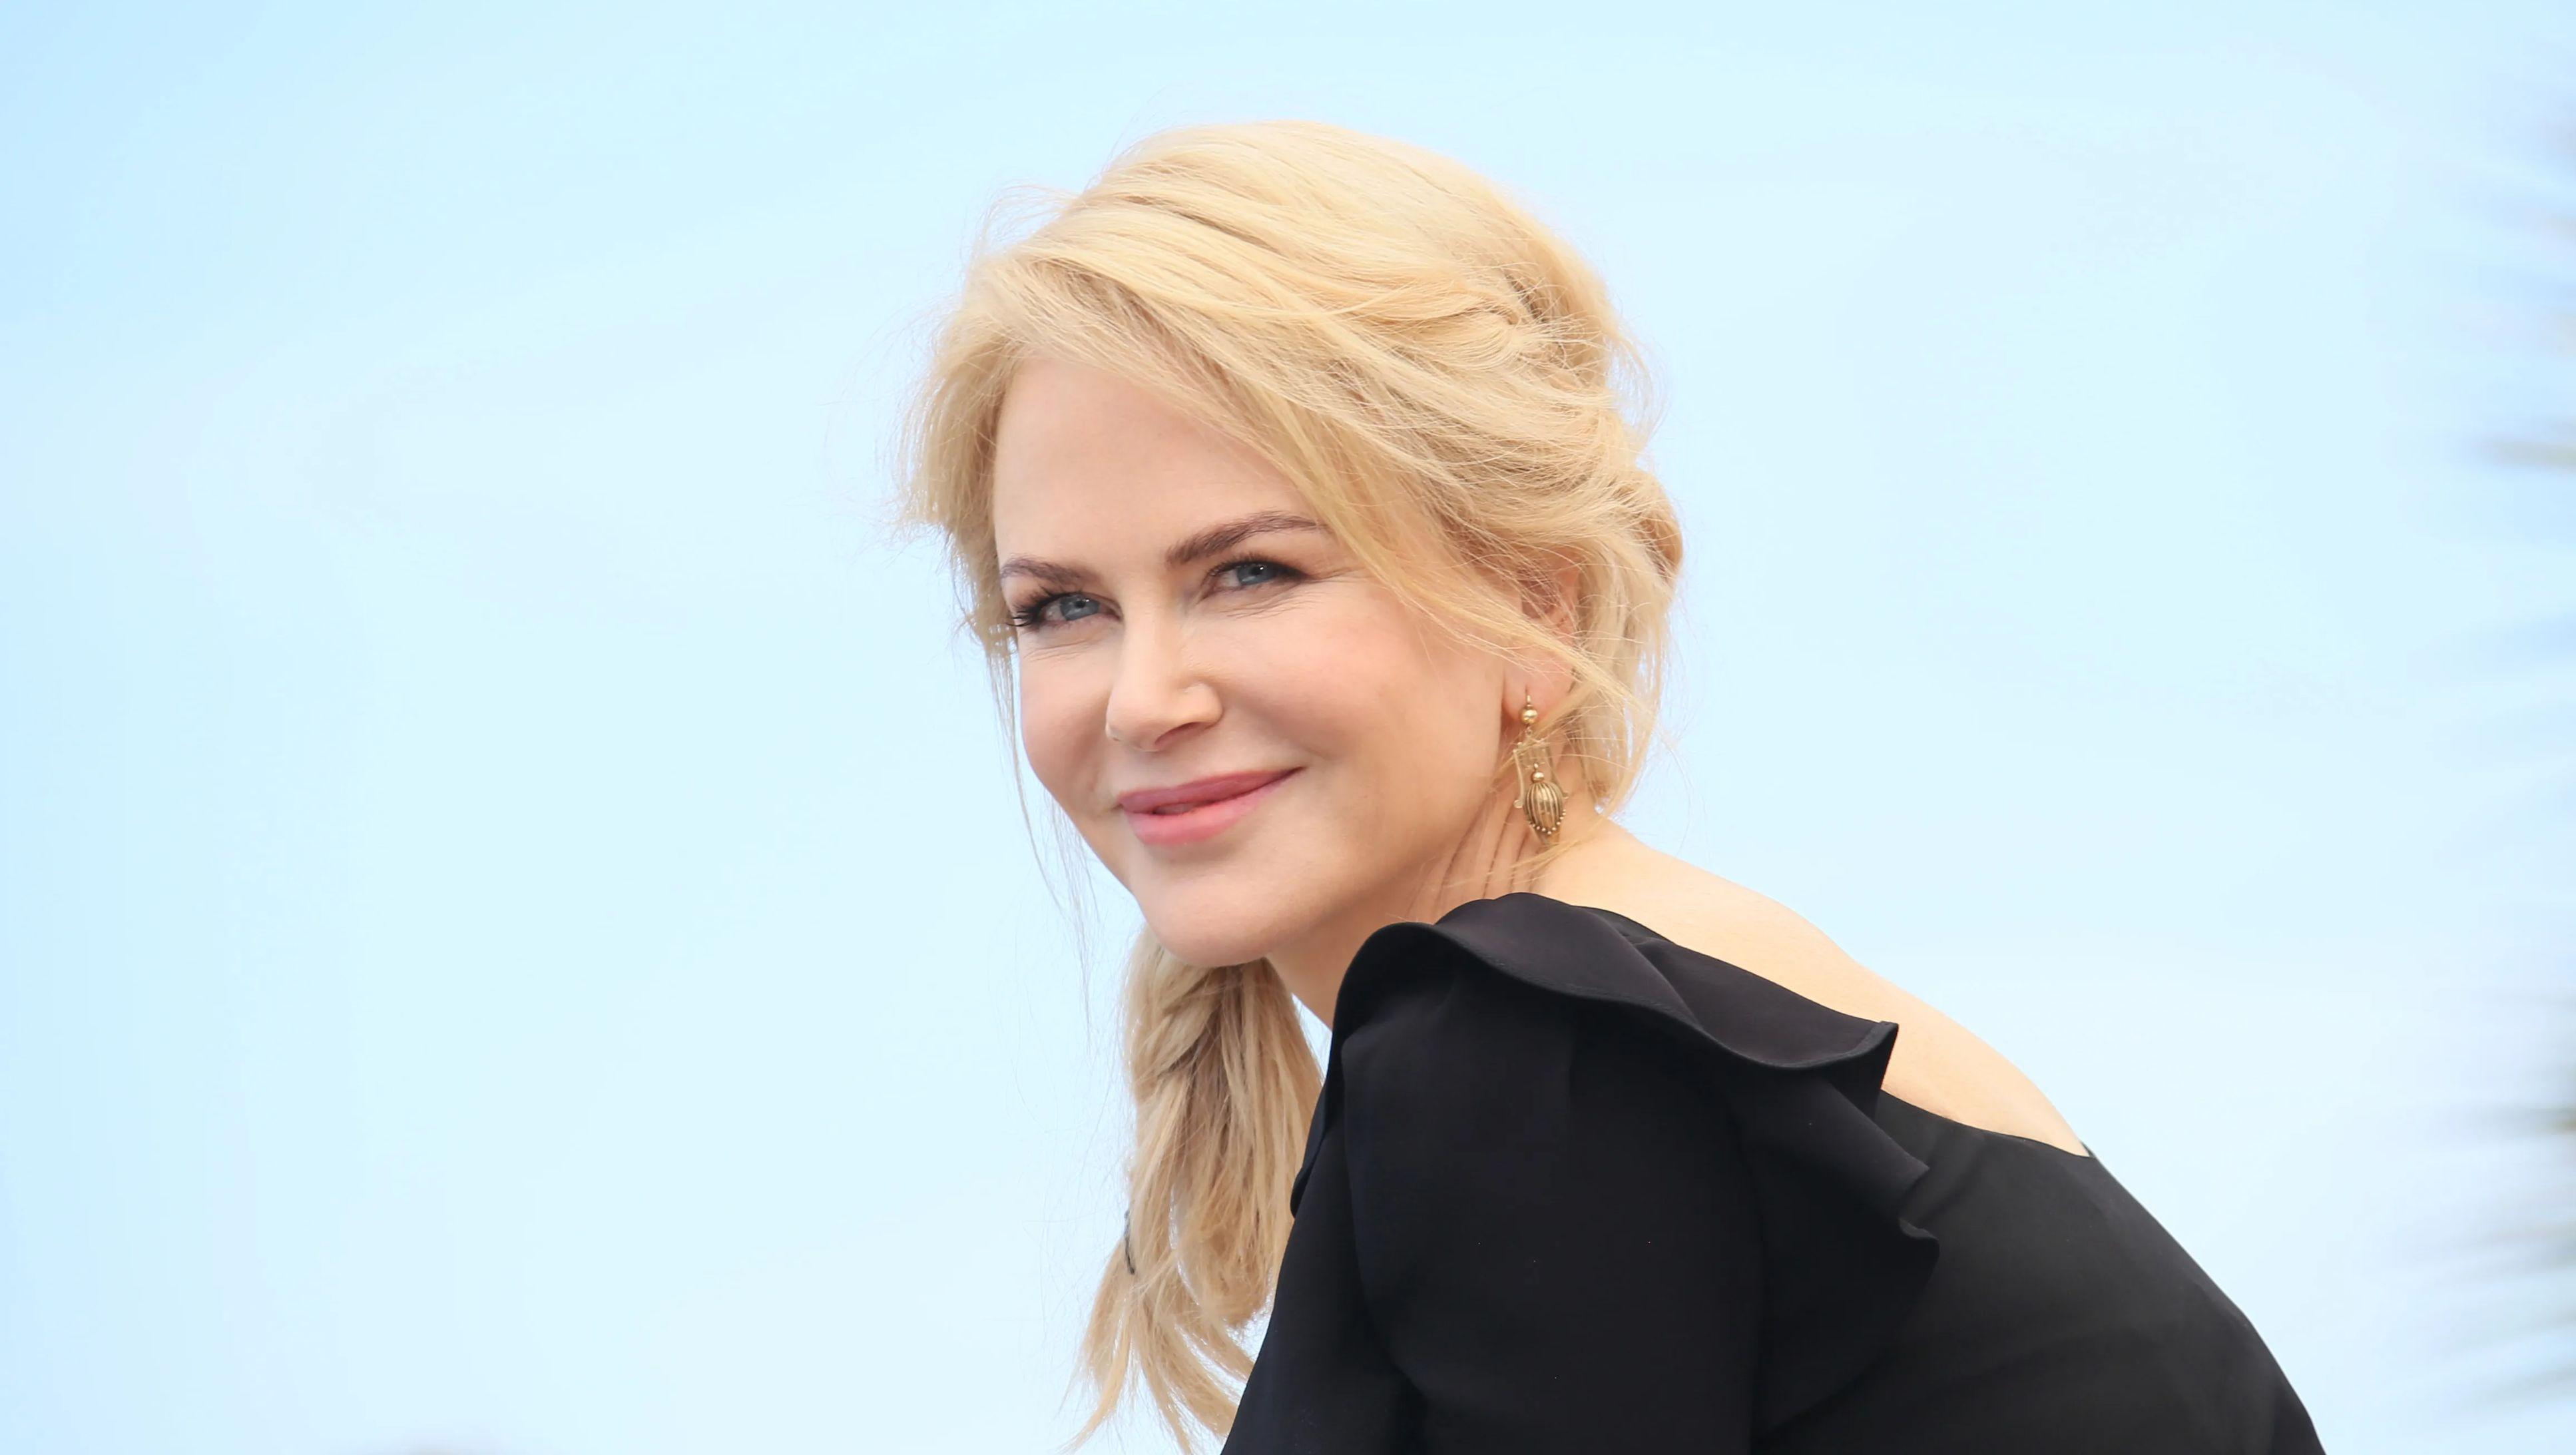 Nicole Kidman with blonde hair and a black dress